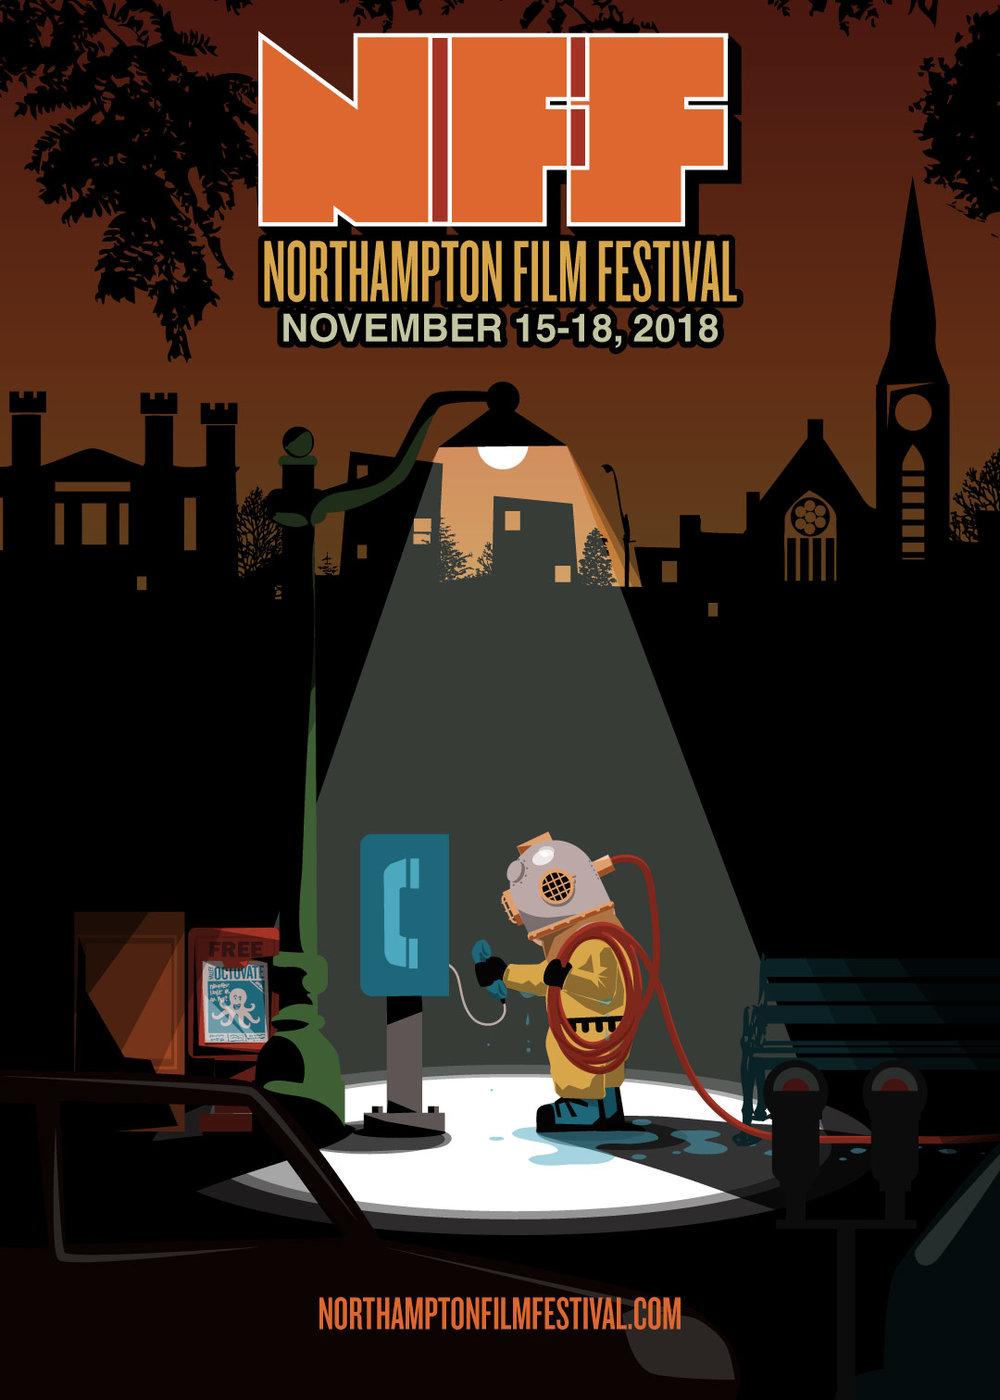 Northampton Film Festival 2018